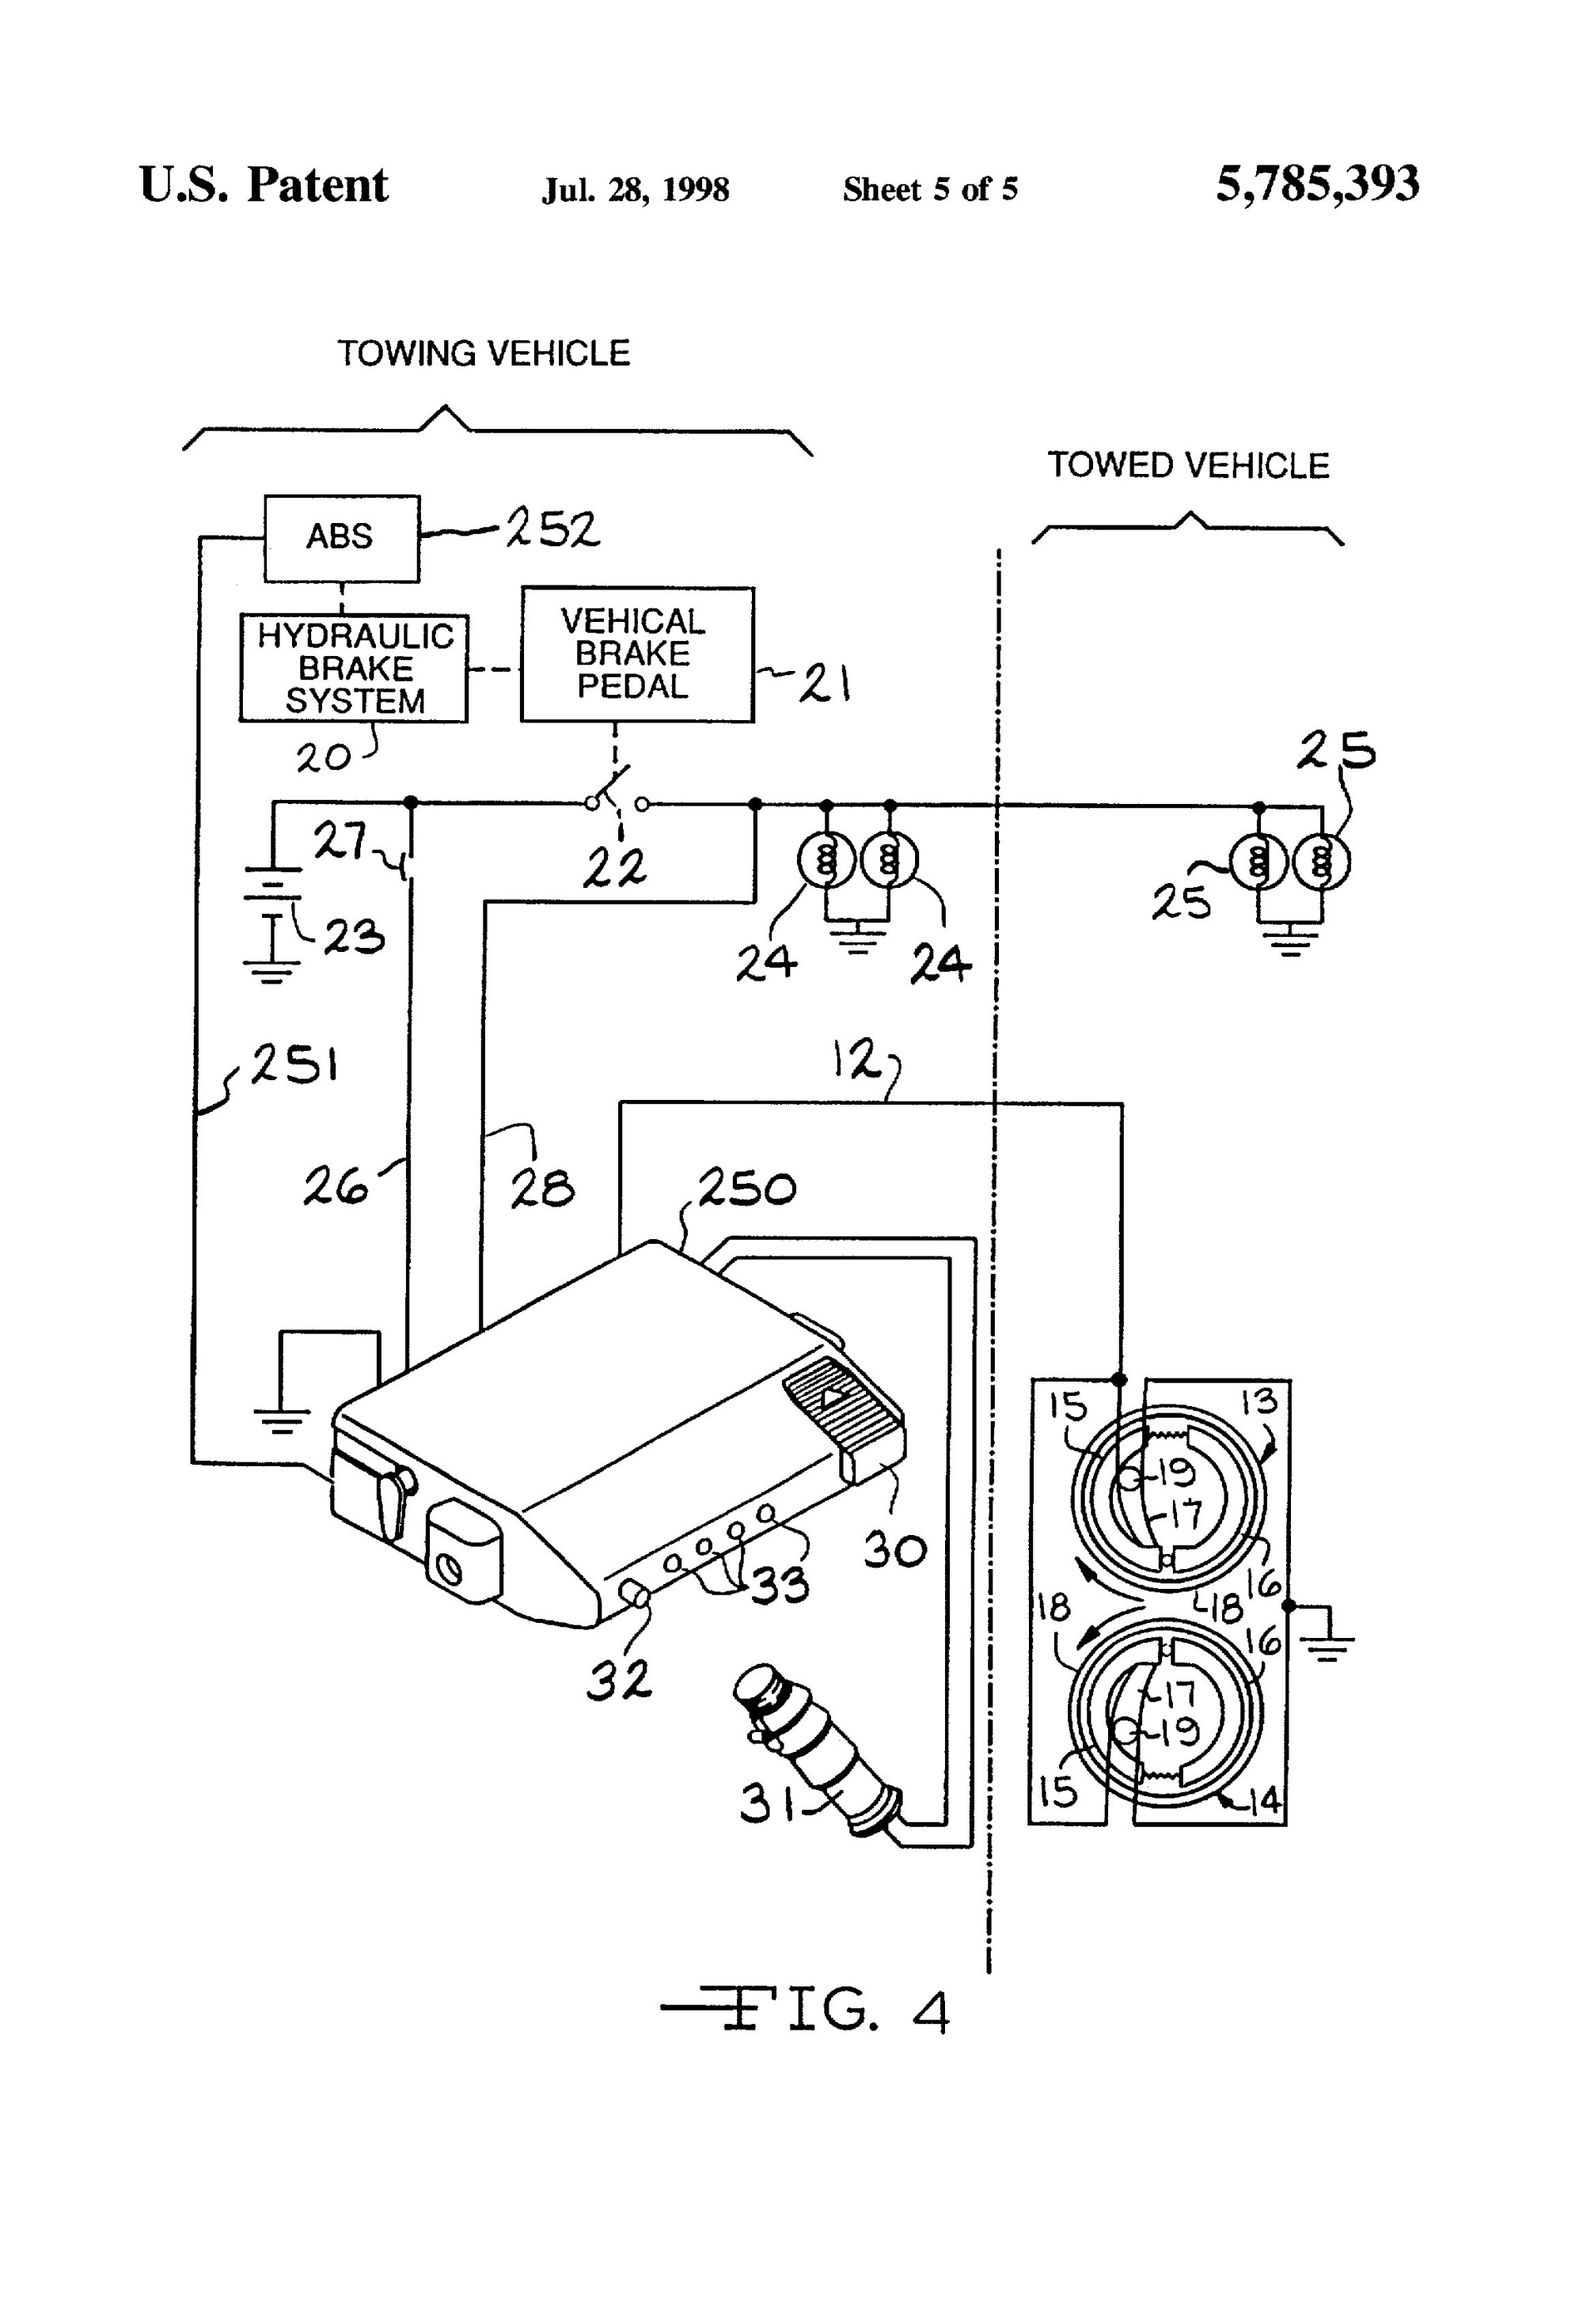 hight resolution of bargman breakaway switch wiring diagram break away systems wiringbargman breakaway switch wiring diagram break away systems